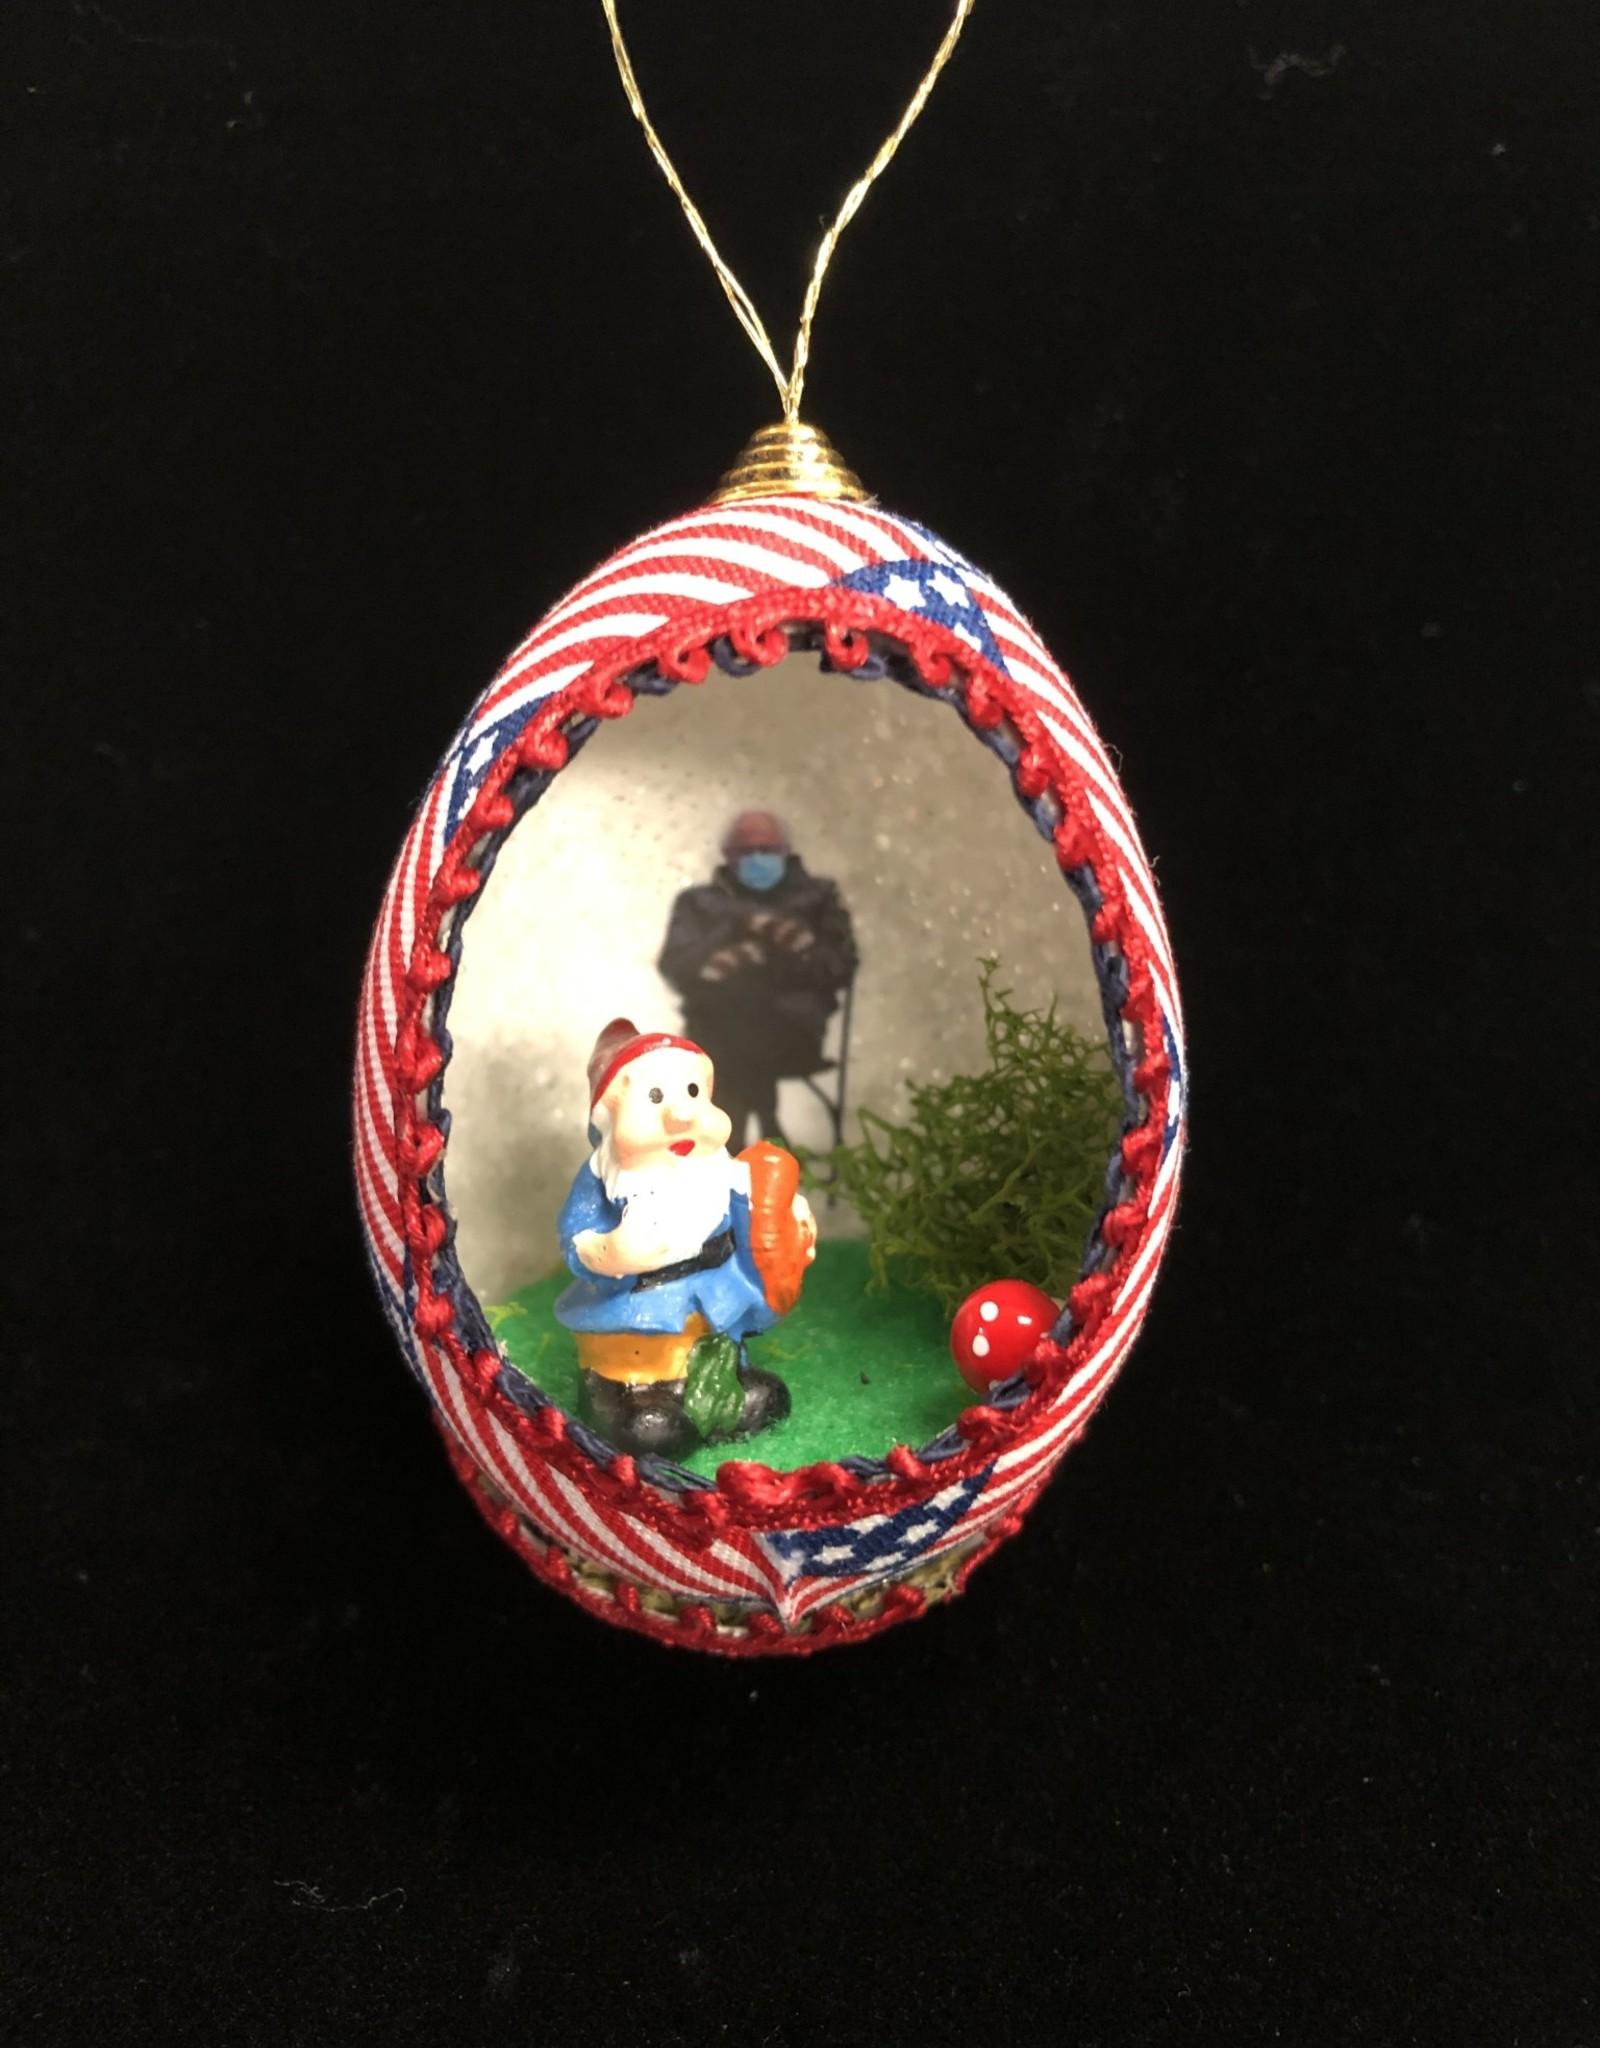 Ammi Brooks Bernie/Gnome Real Egg Ornament